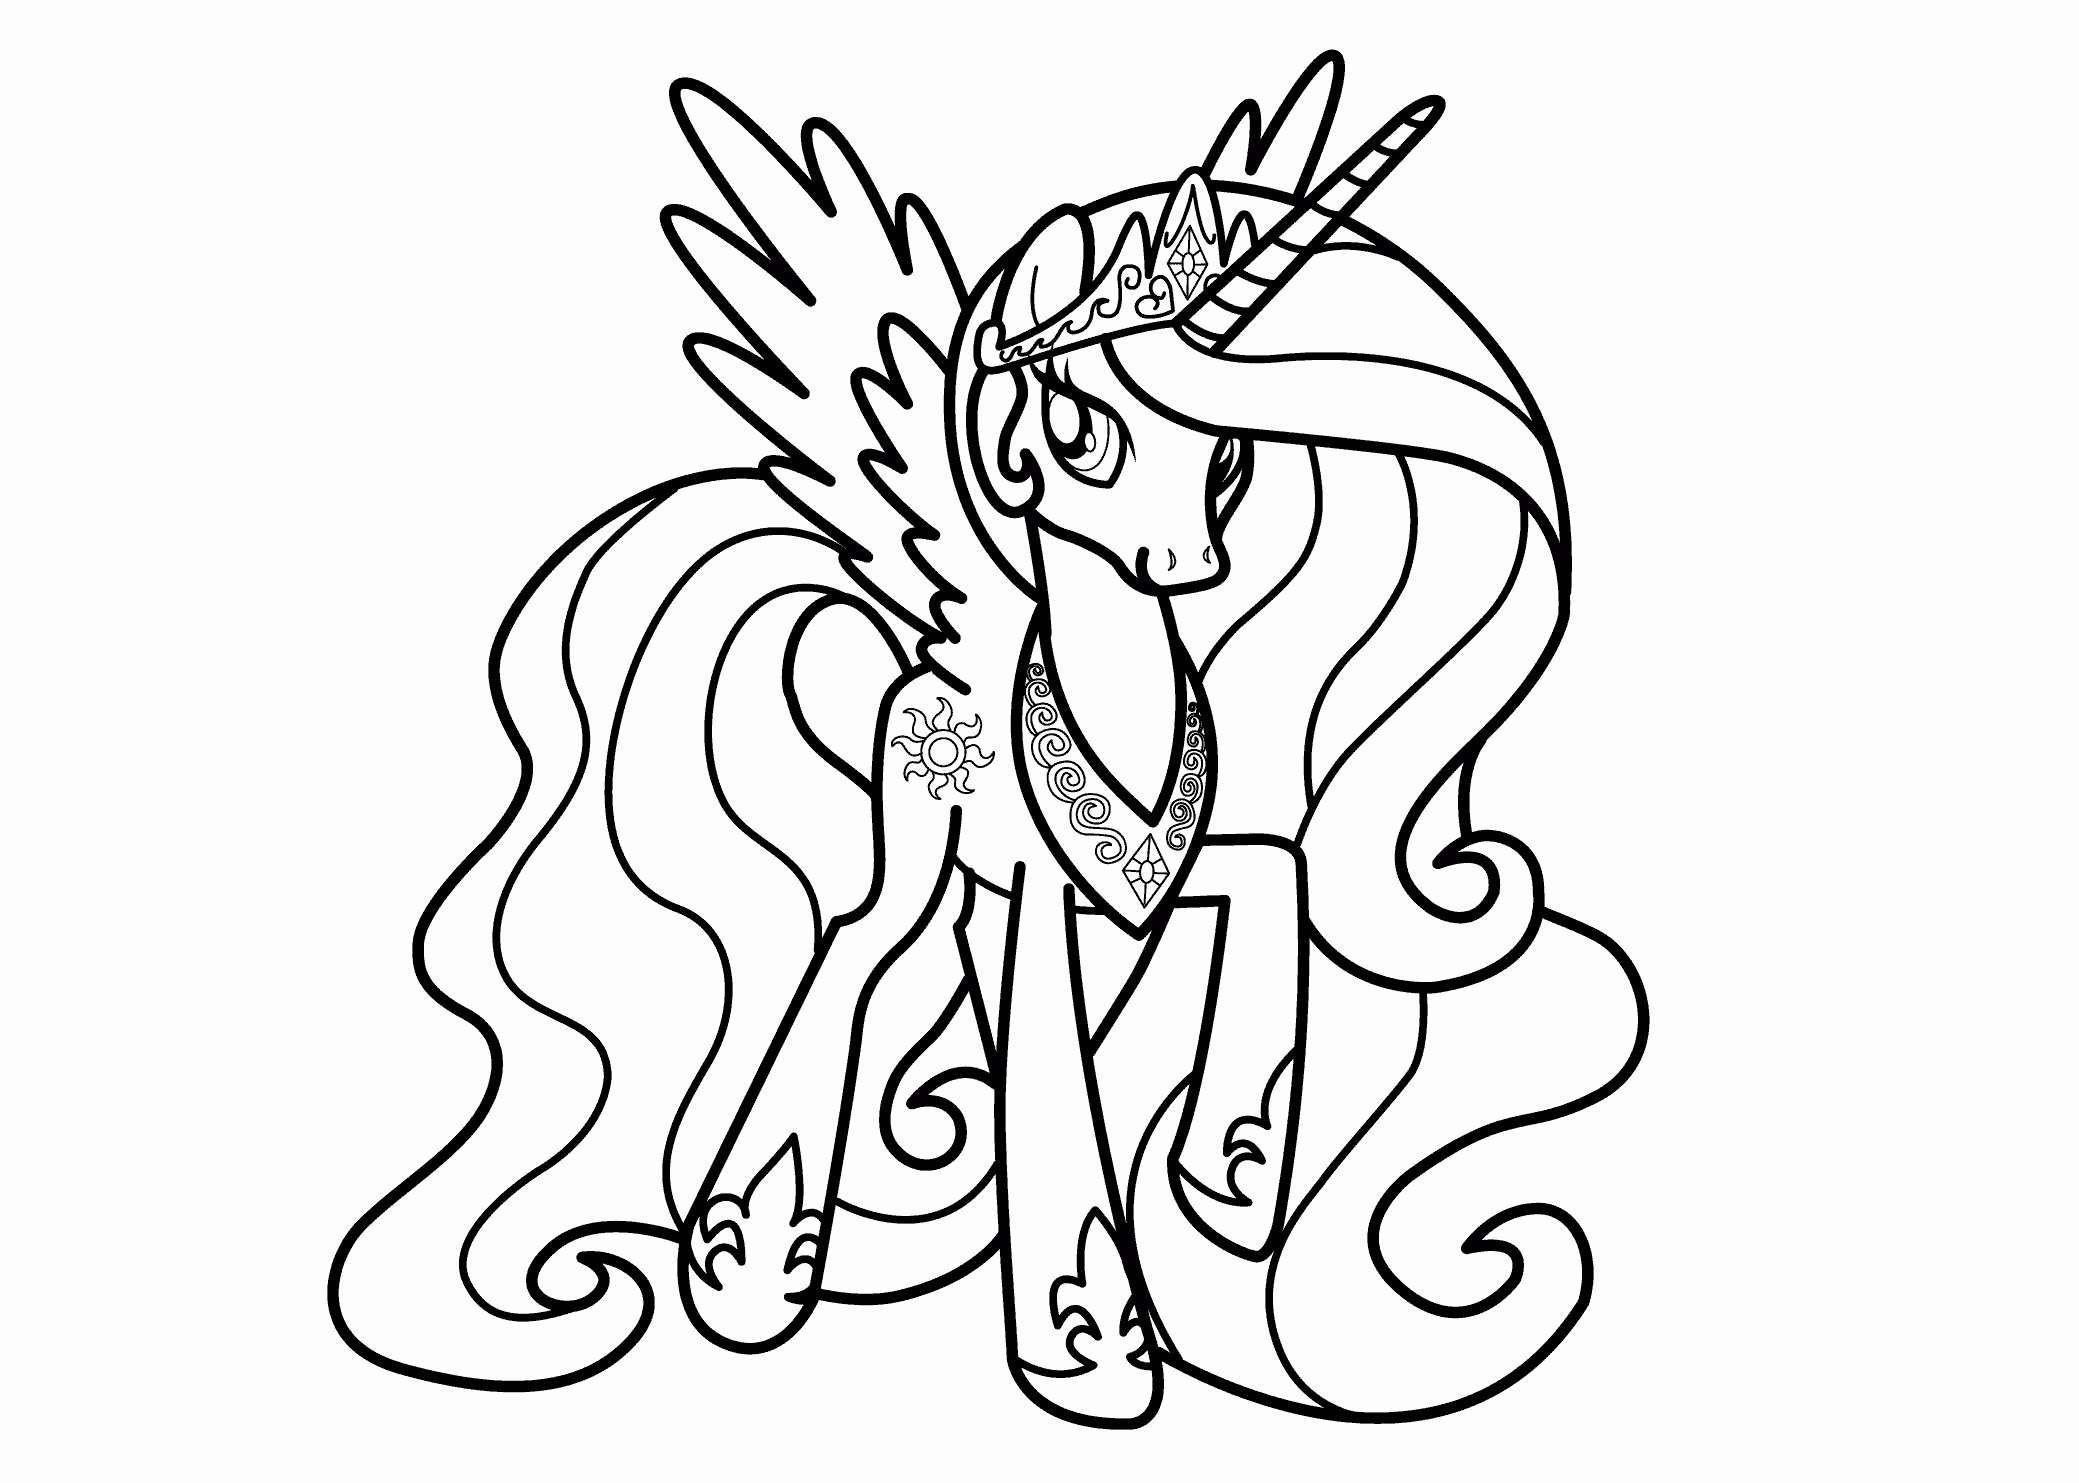 Ausmalbilder My Little Pony Rainbow Dash Einzigartig My Little Pony Princess Cadence Free Coloring Sheets Genial Sammlung